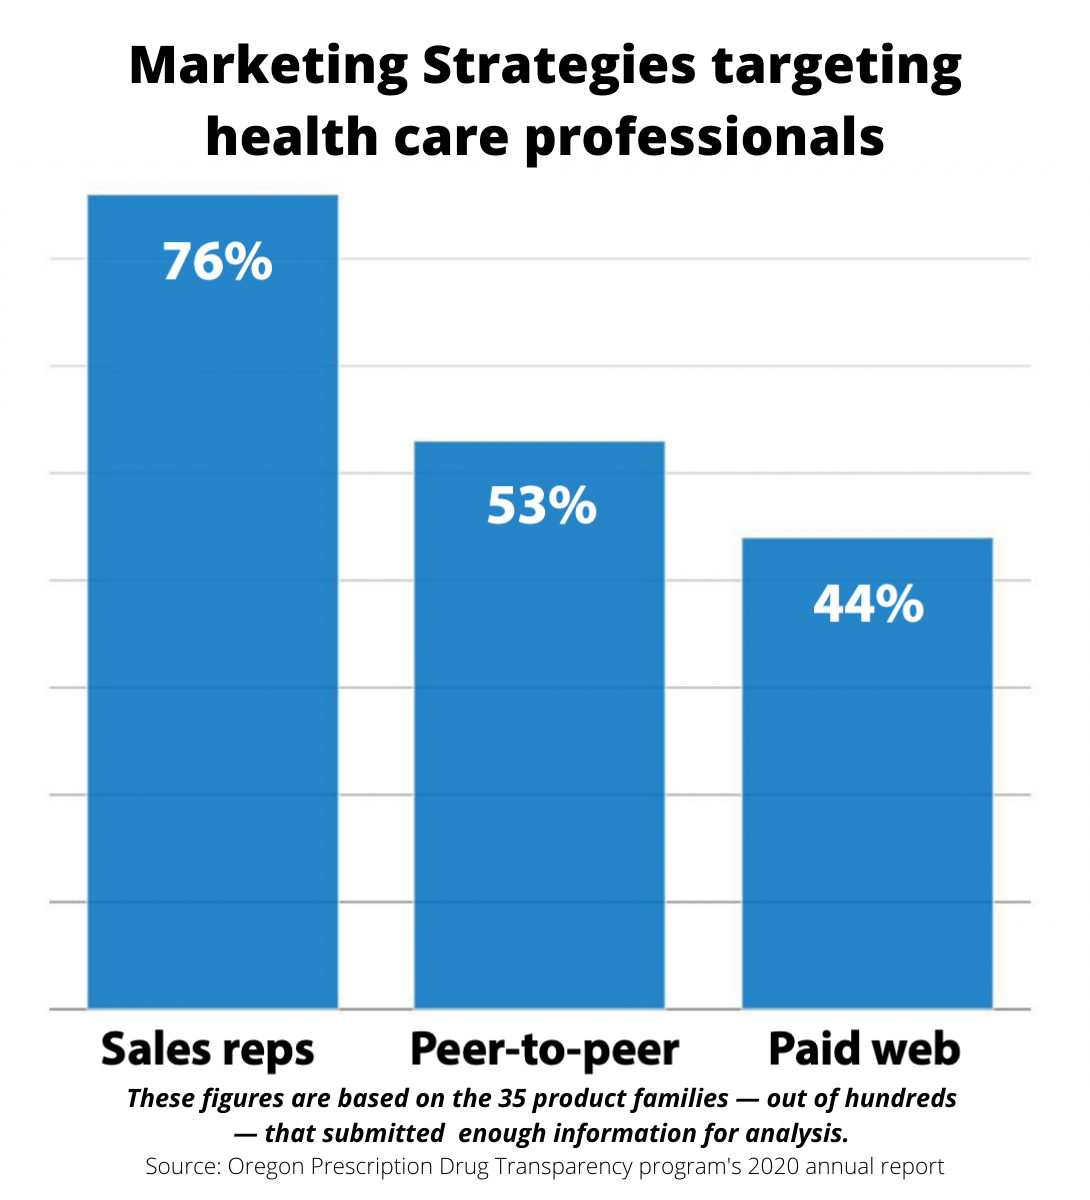 Marketing strategies targeting health care professionals